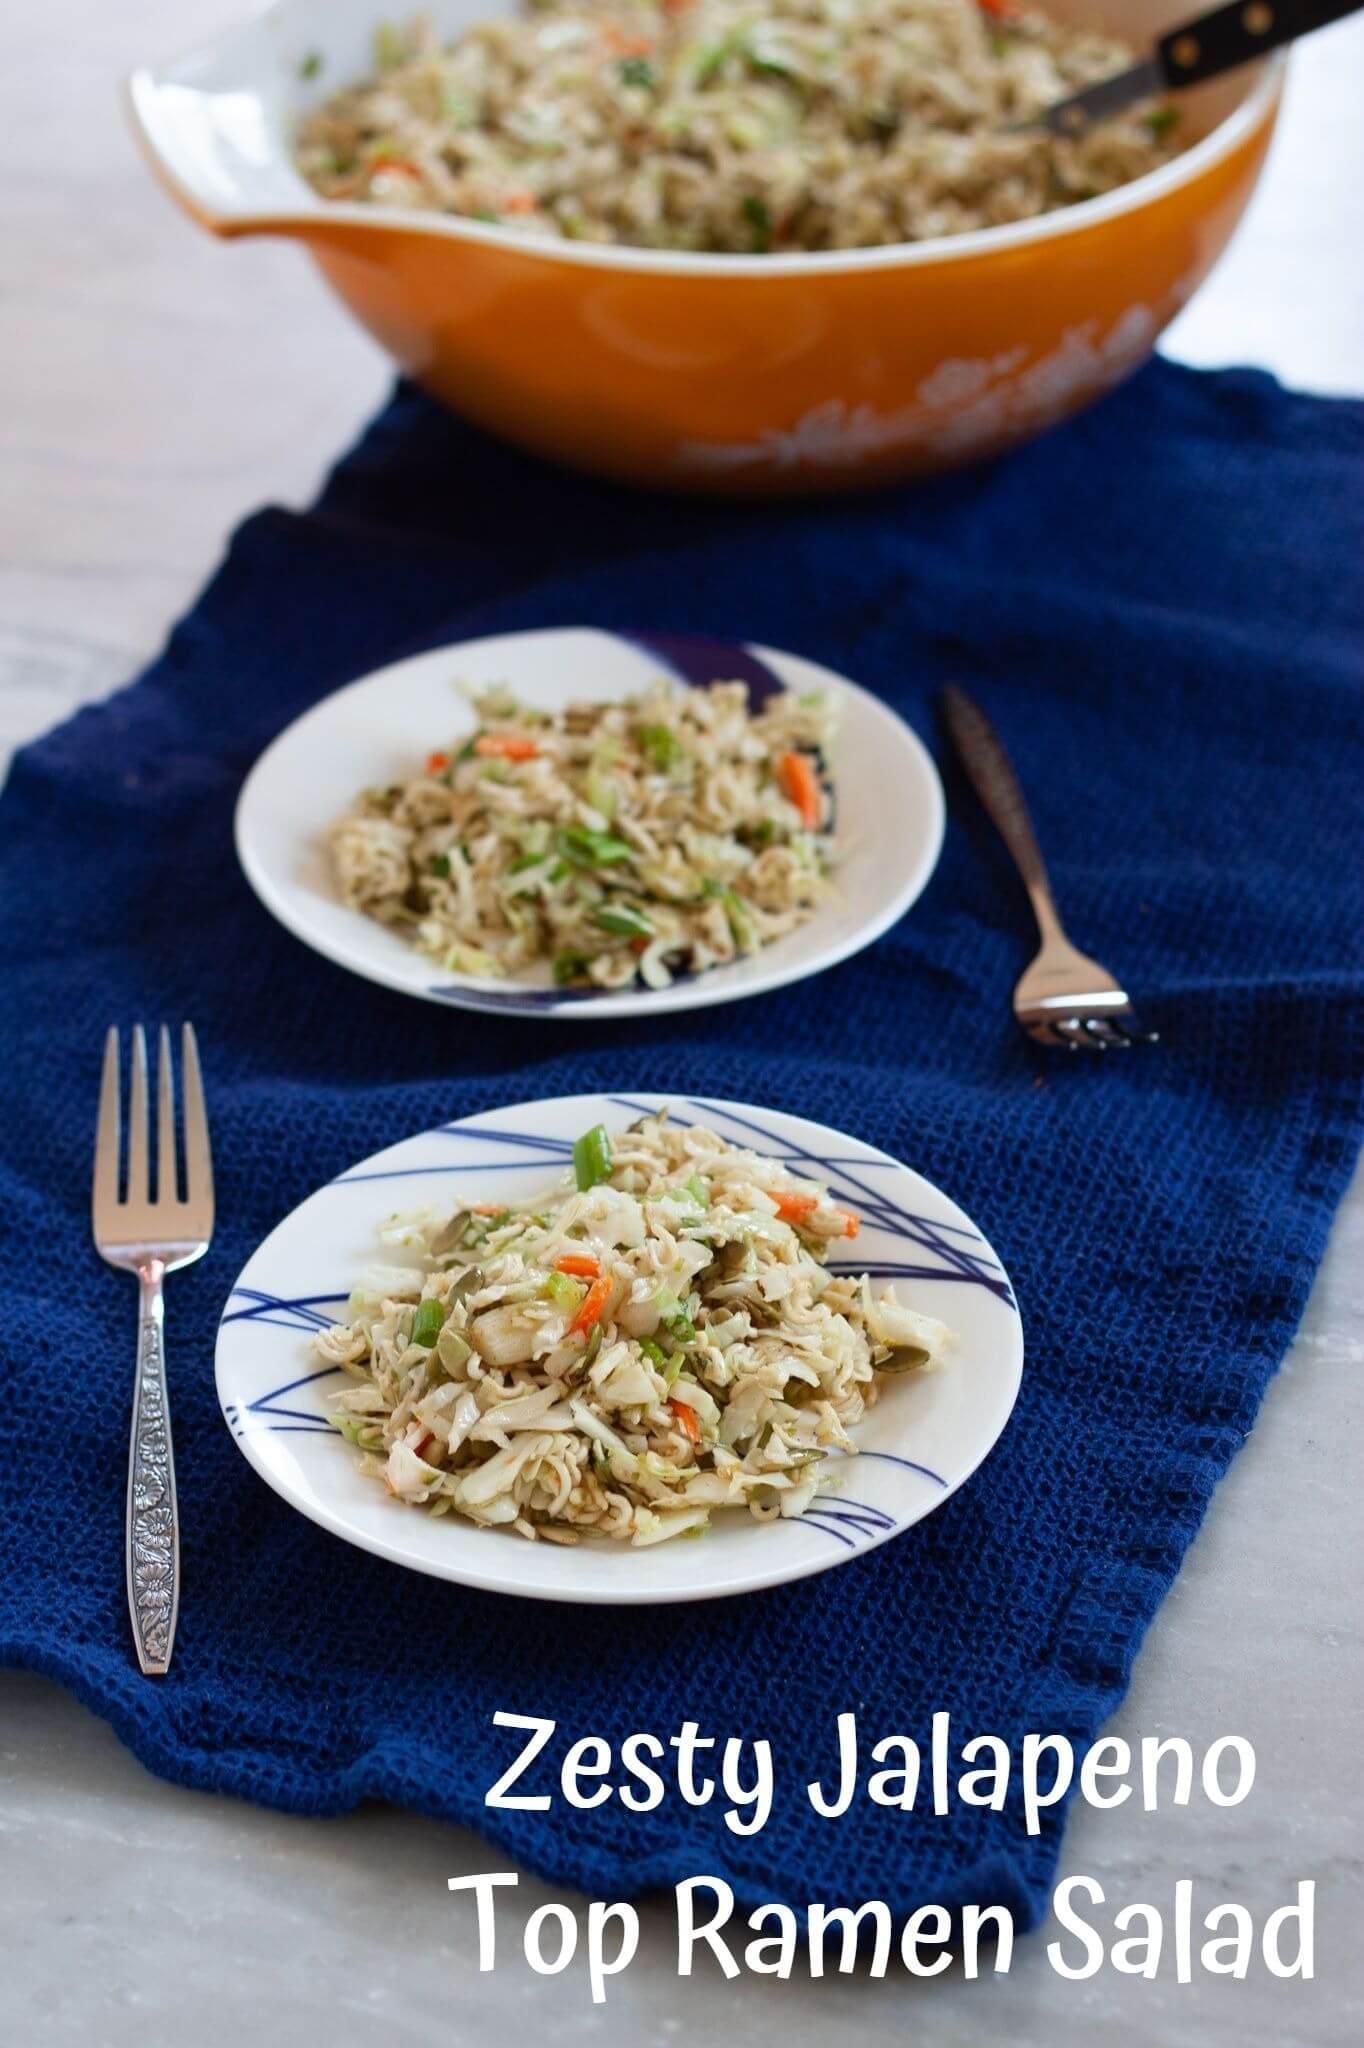 Zesty Jalapeno Top Ramen Salad